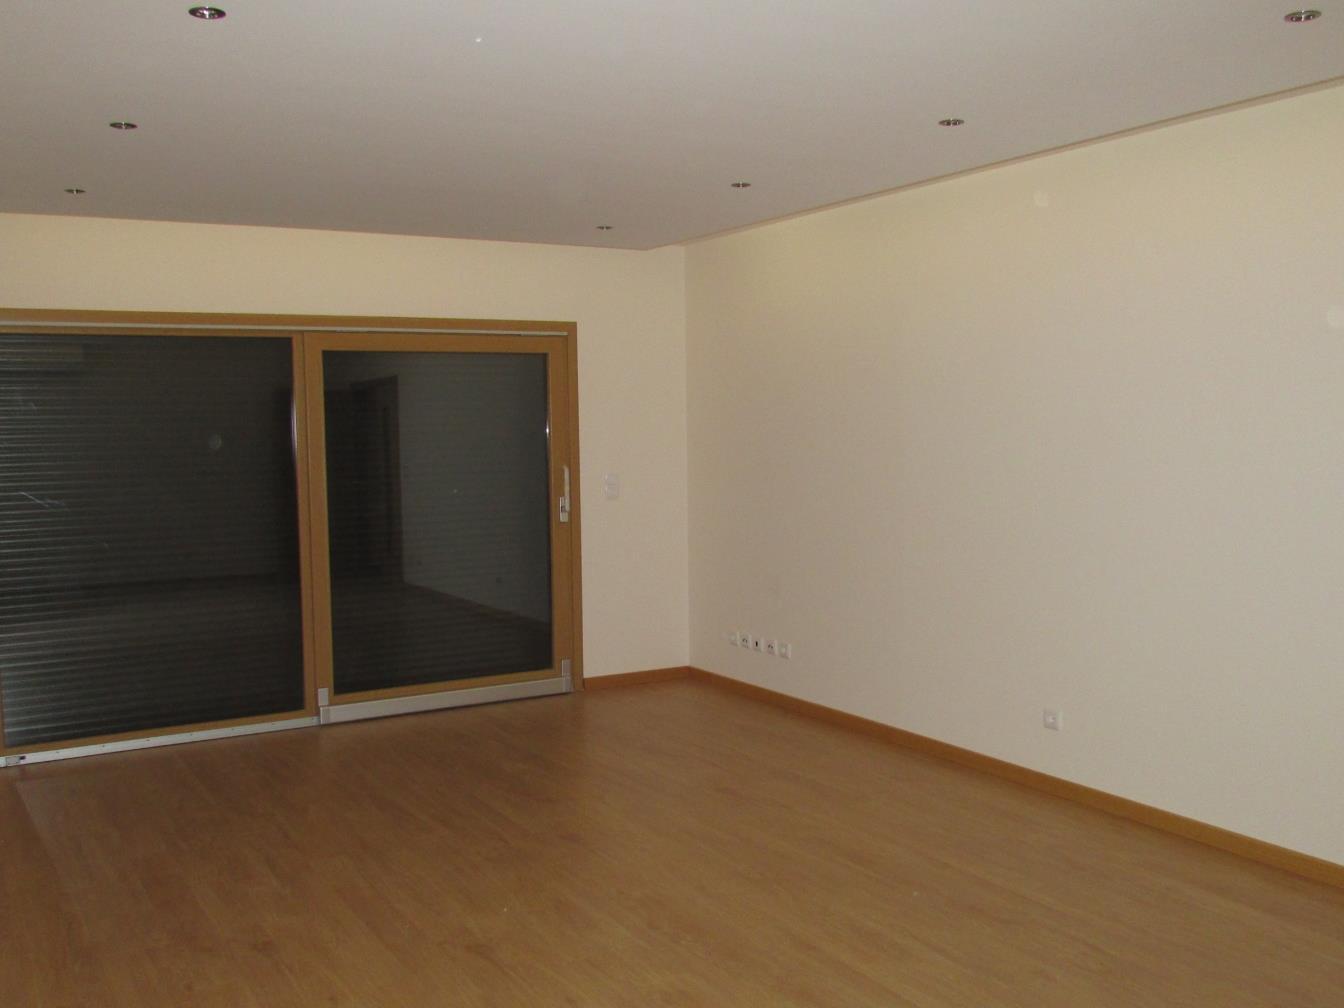 Apartment for Sale at Flat, 3 bedrooms, for Sale Lumiar, Lisboa, Lisboa Portugal